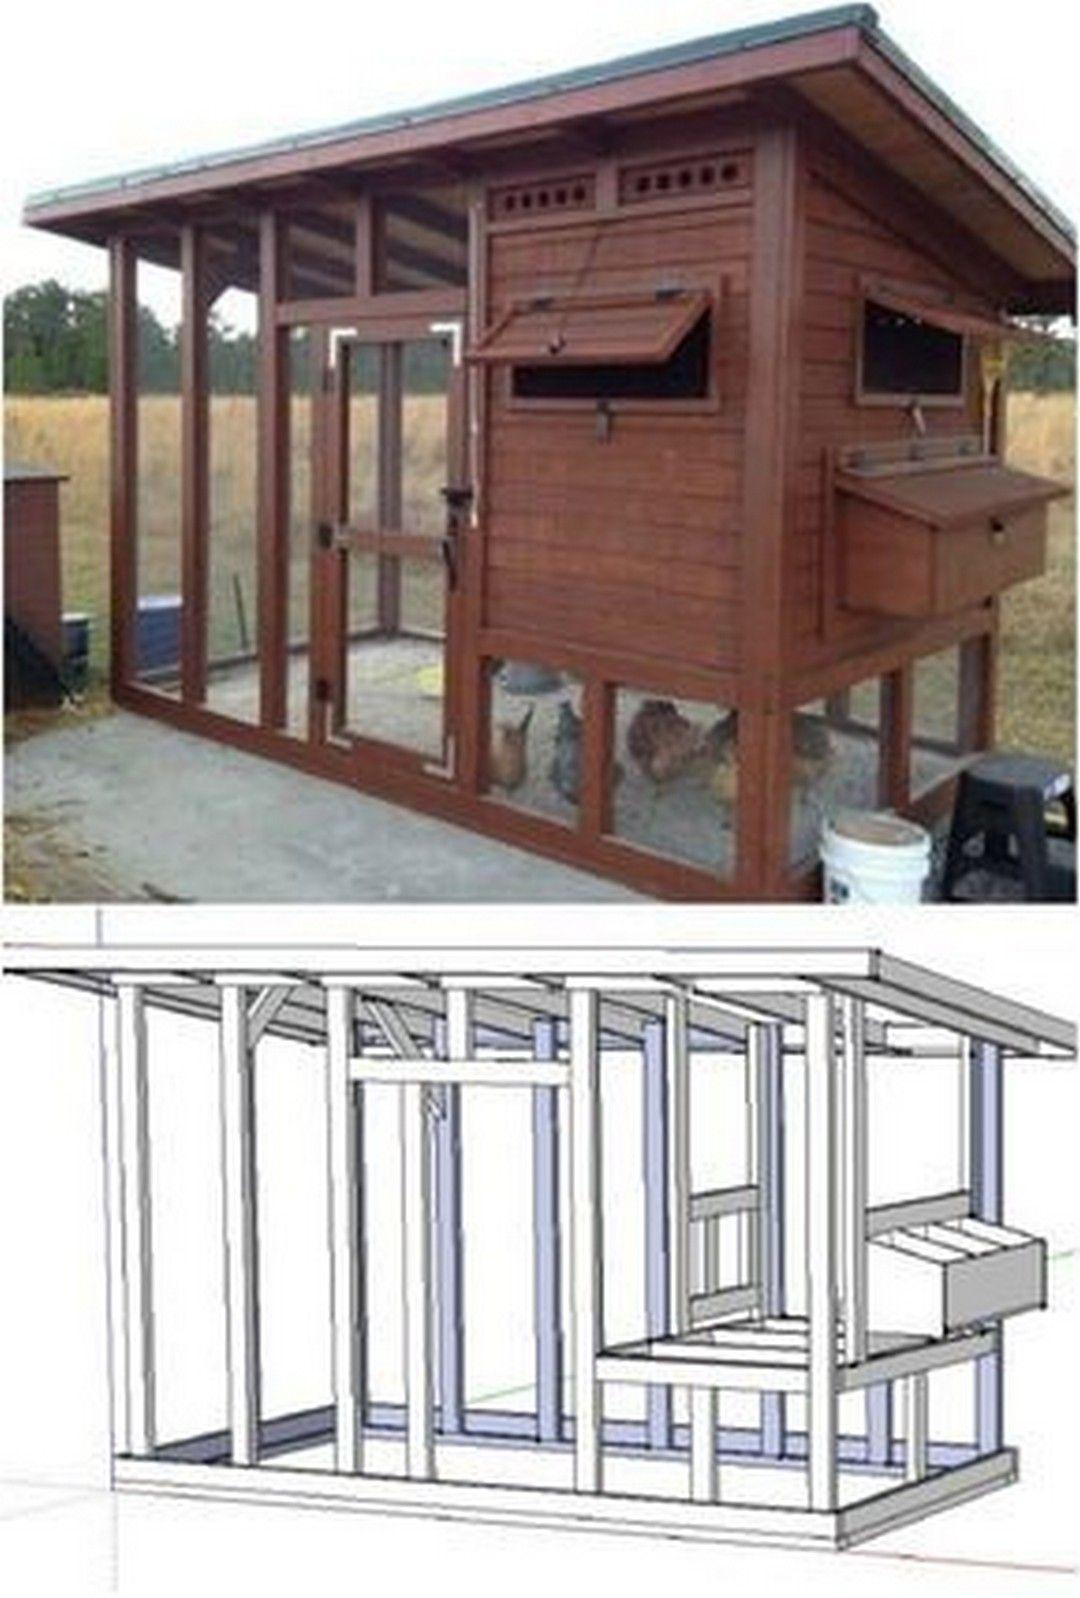 Chicken Coop Plans Pdf Easy 6x8 Diy Chicken Coop Backyard Chicken Coop Chicken Diy Easy Diy Chicken Coop Plans Diy Chicken Coop Plans